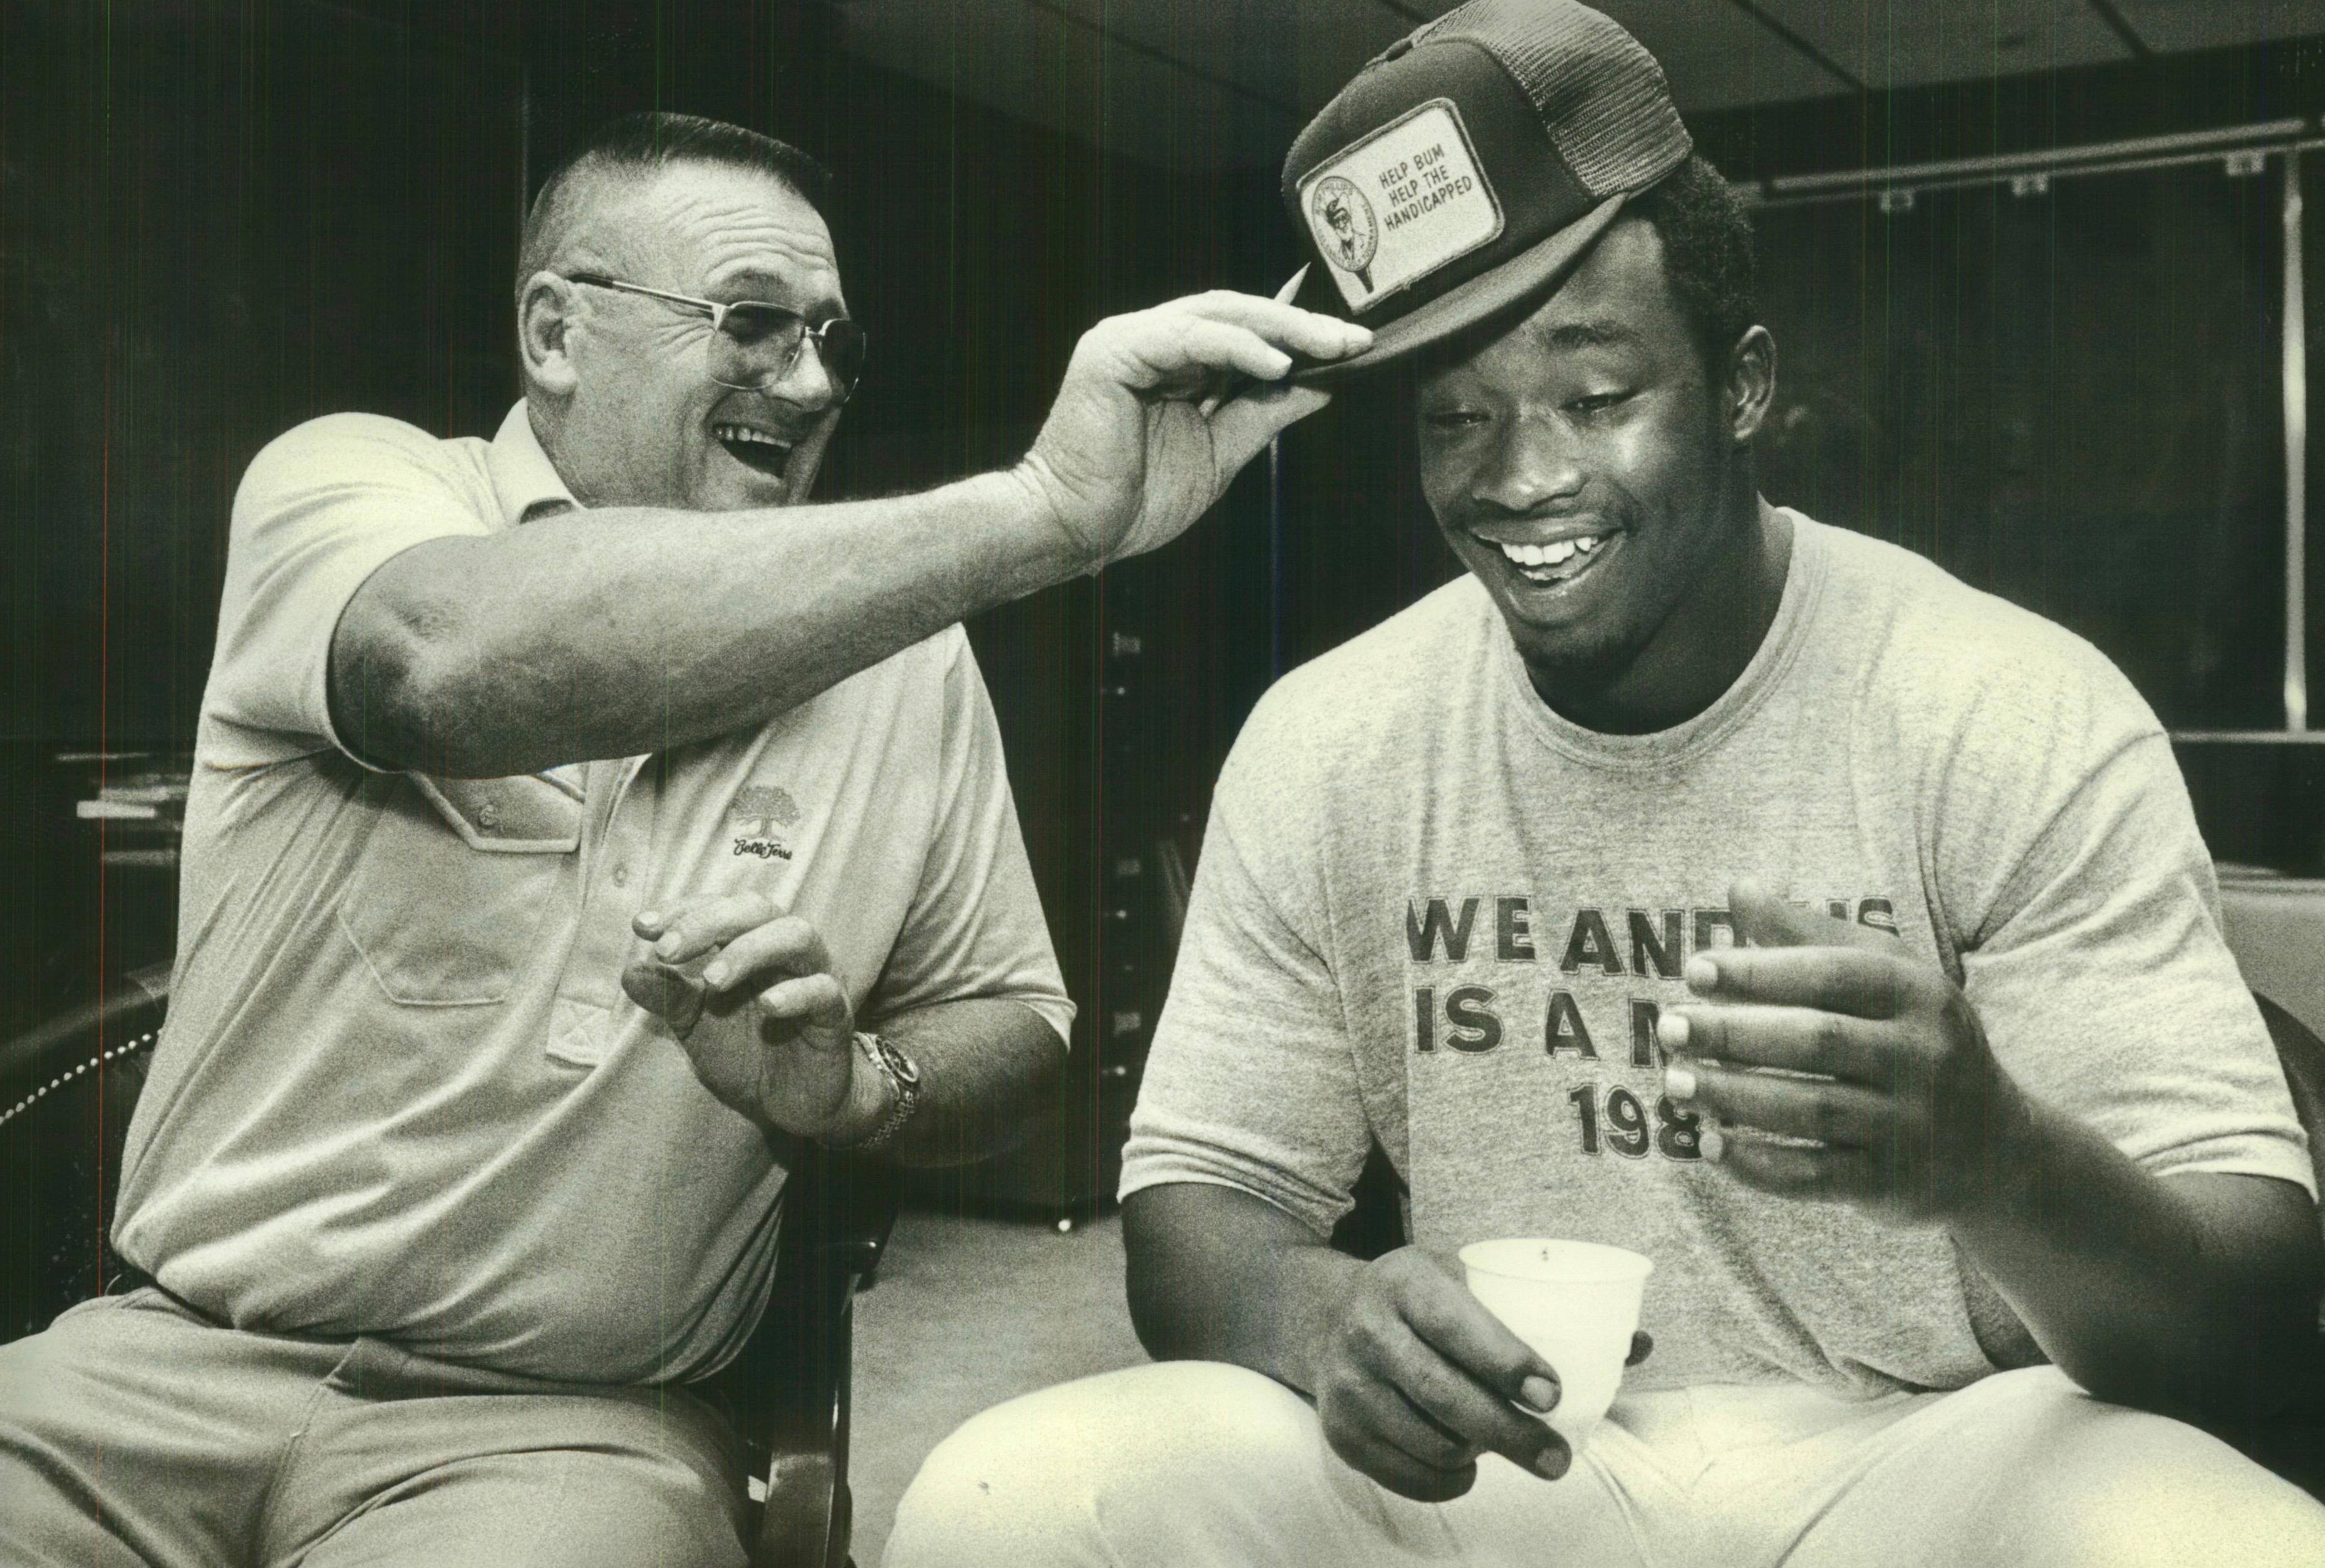 Faith, hope and Bum Phillips: Remembering the New Orleans Saints' cowboy  coach – Mike Scott